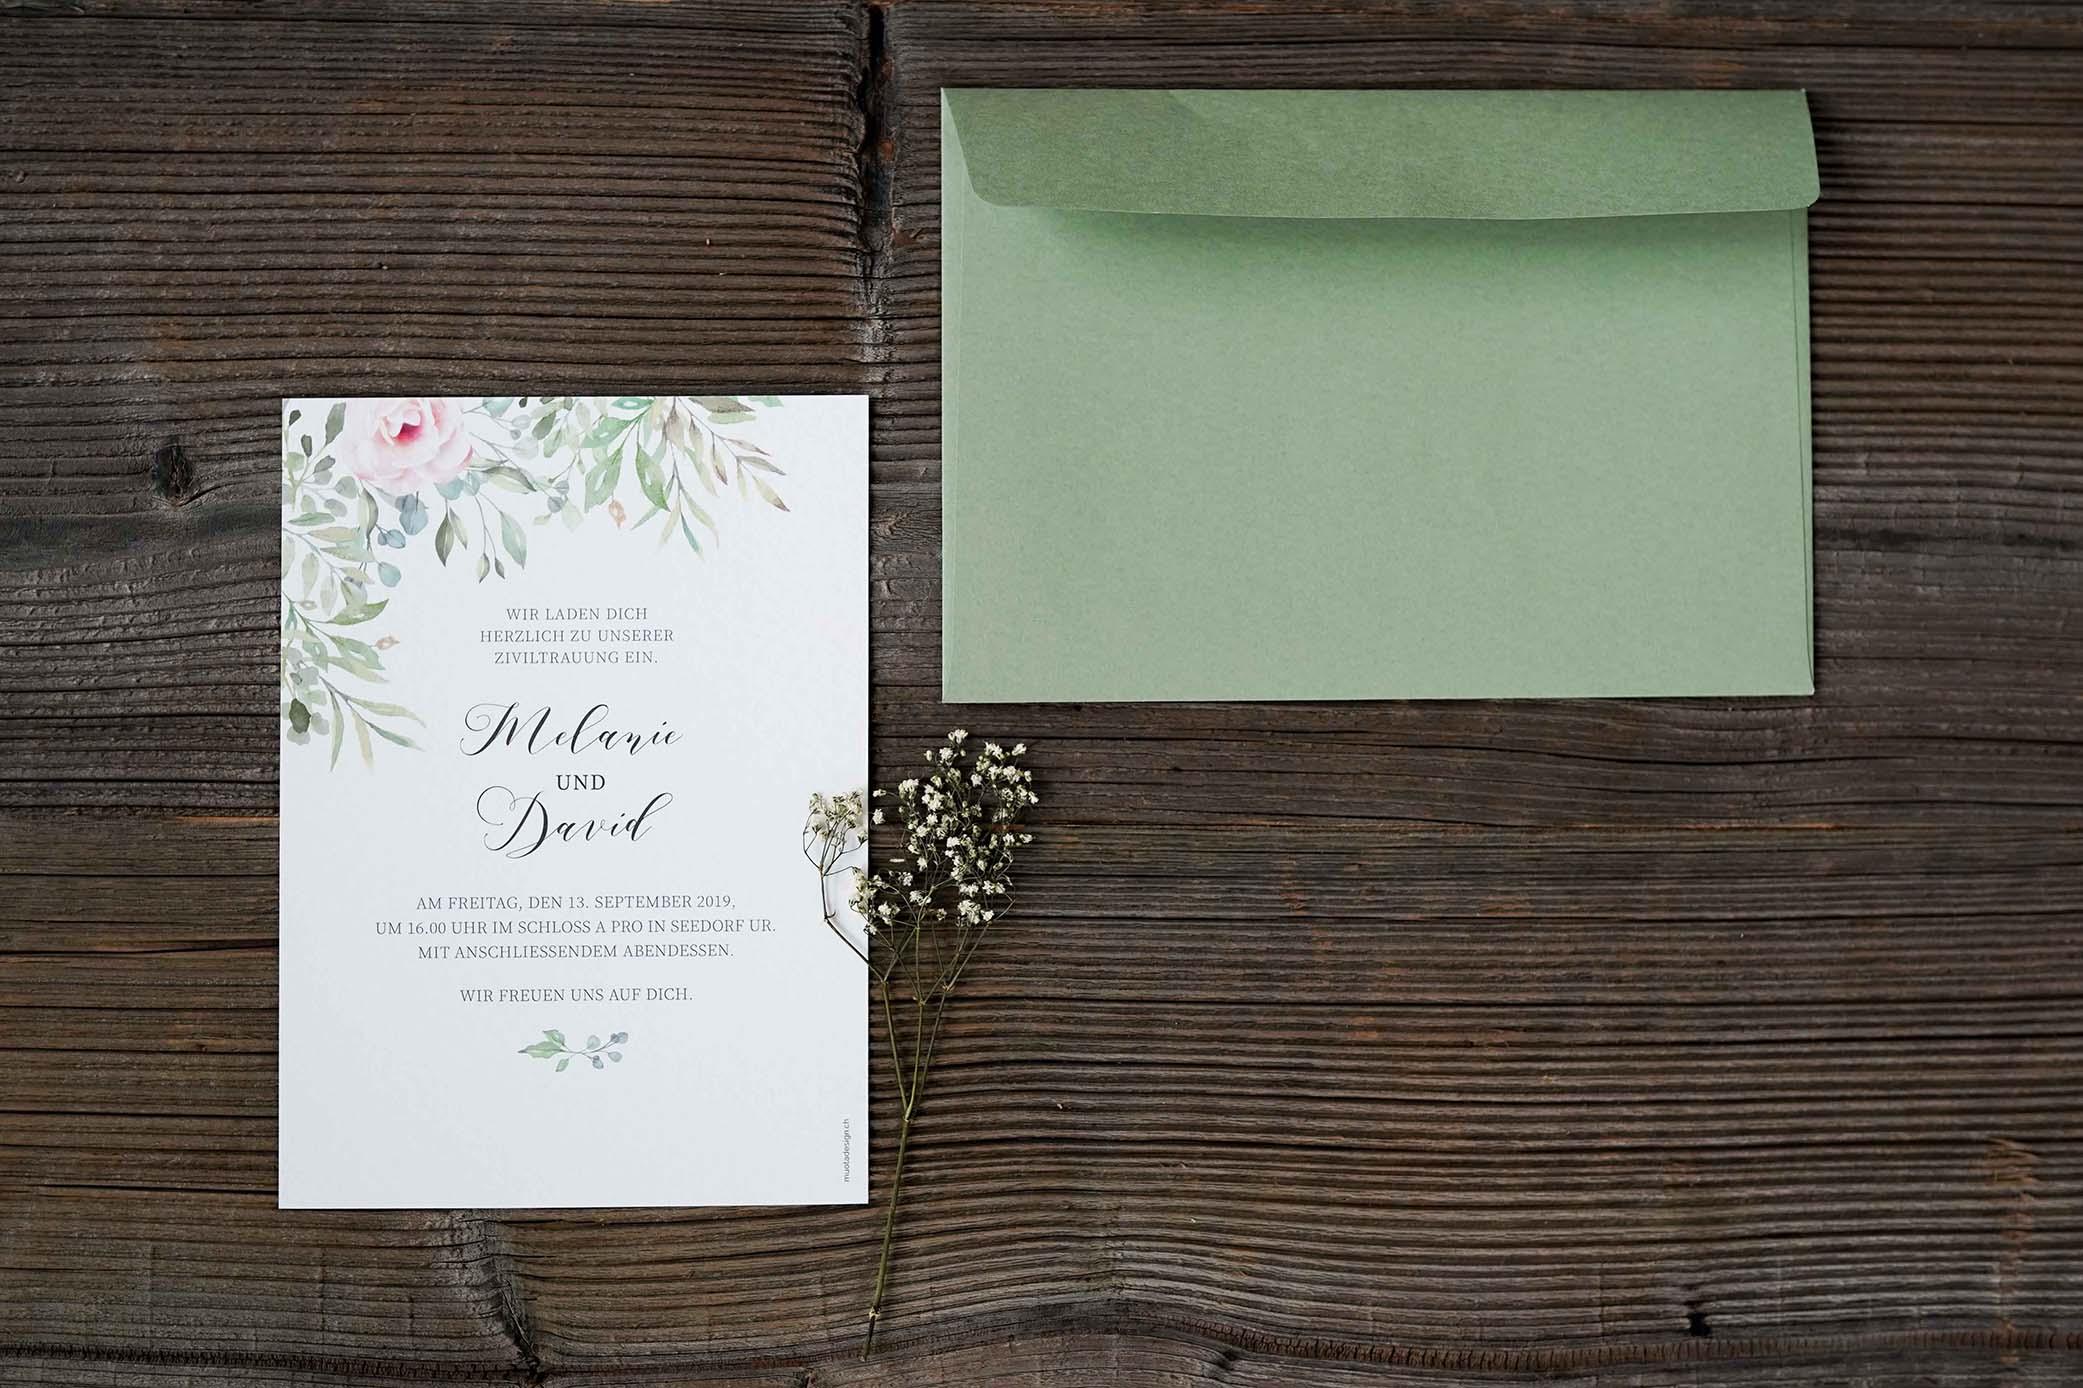 Hochzeitskarte David & Melanie